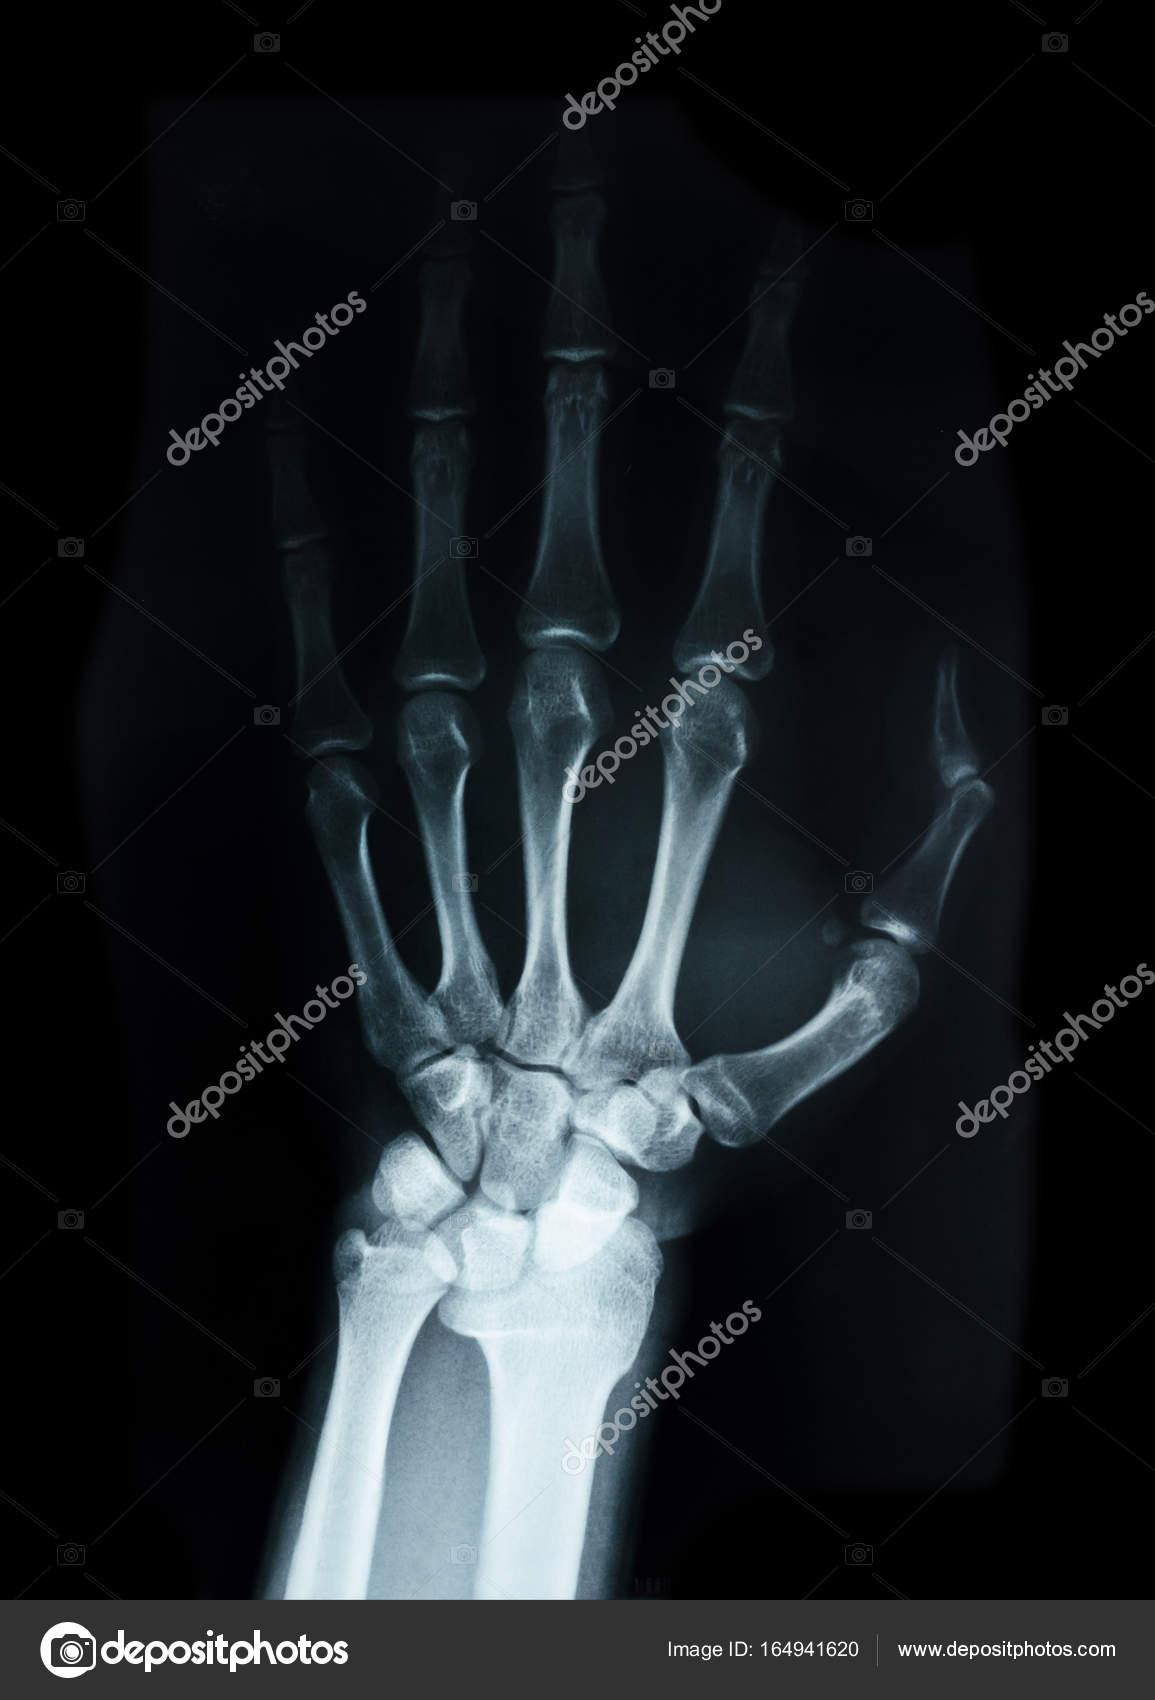 Huesos del carpo humano de rayos X — Foto de stock © gamjai #164941620